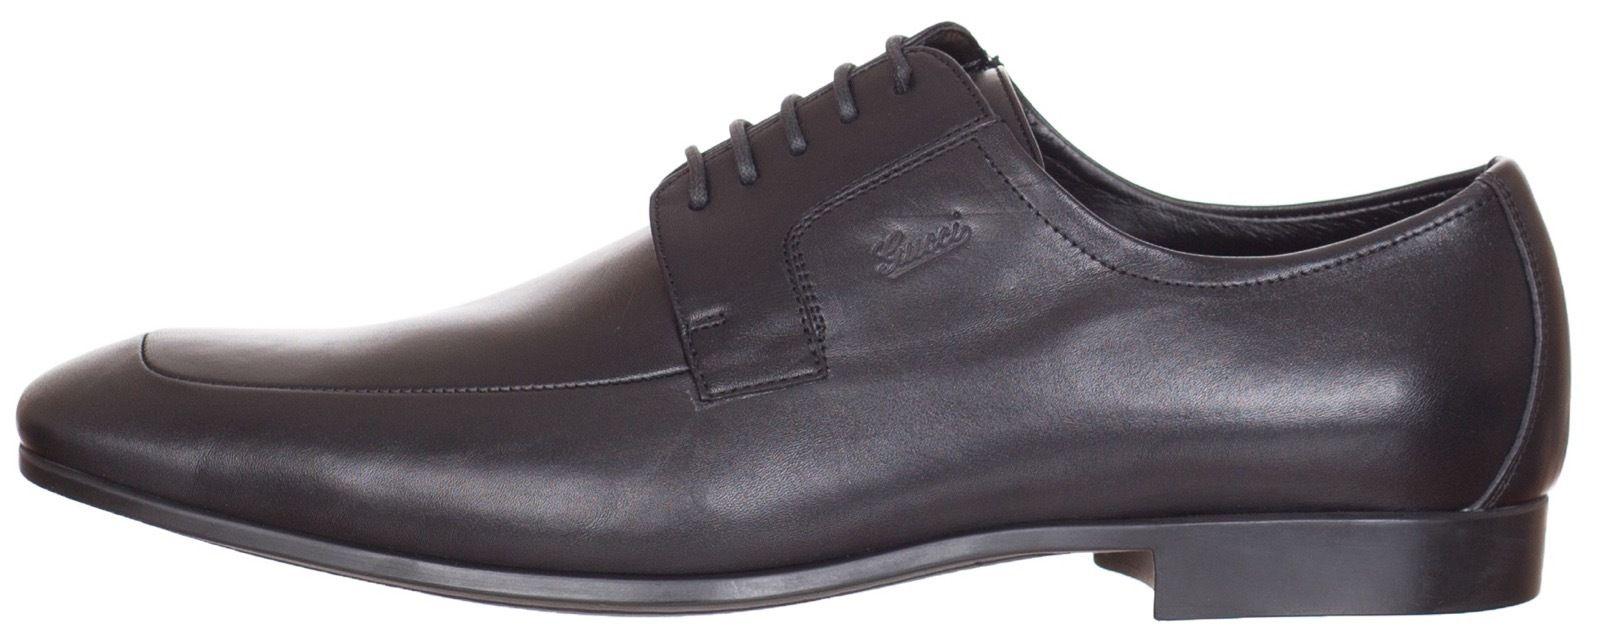 cdbbd7d69c $595 Gucci Black Leather Lace Up Oxford Dress Shoes US 9.5 10 10.5 ...